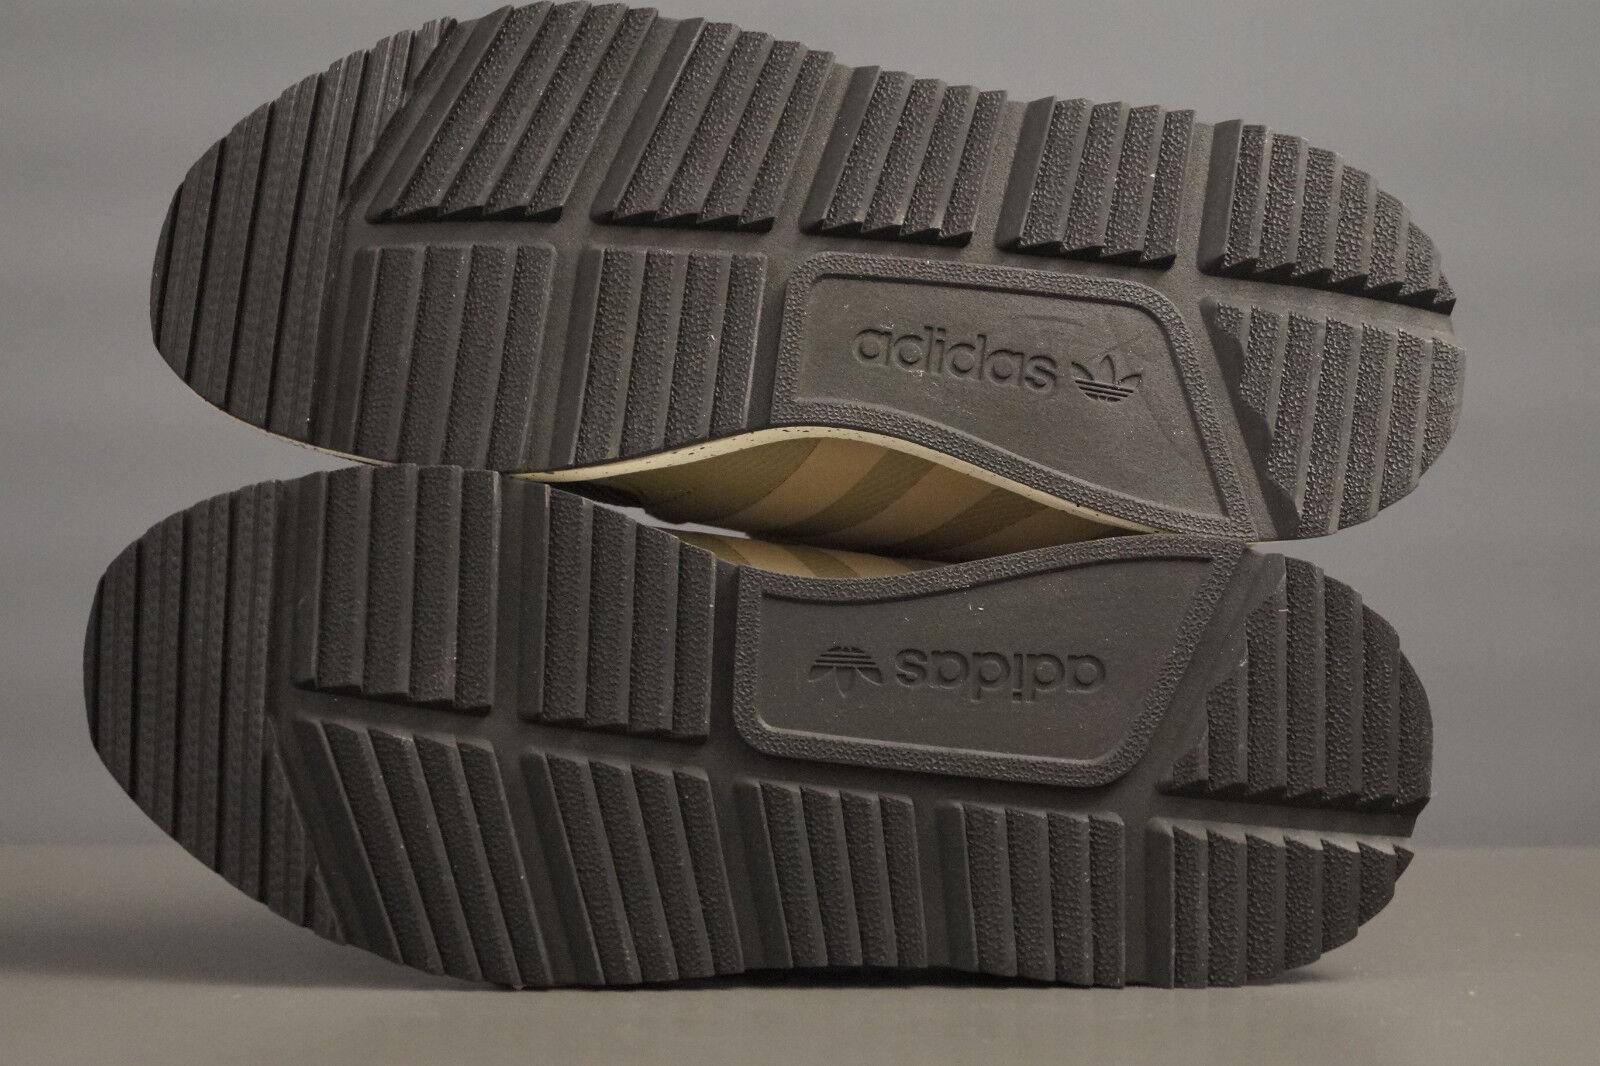 adidas originals X_PLR SNKRBOOT WINTER WINTER WINTER oliv/khaki BZ0670 Herren e93ddb